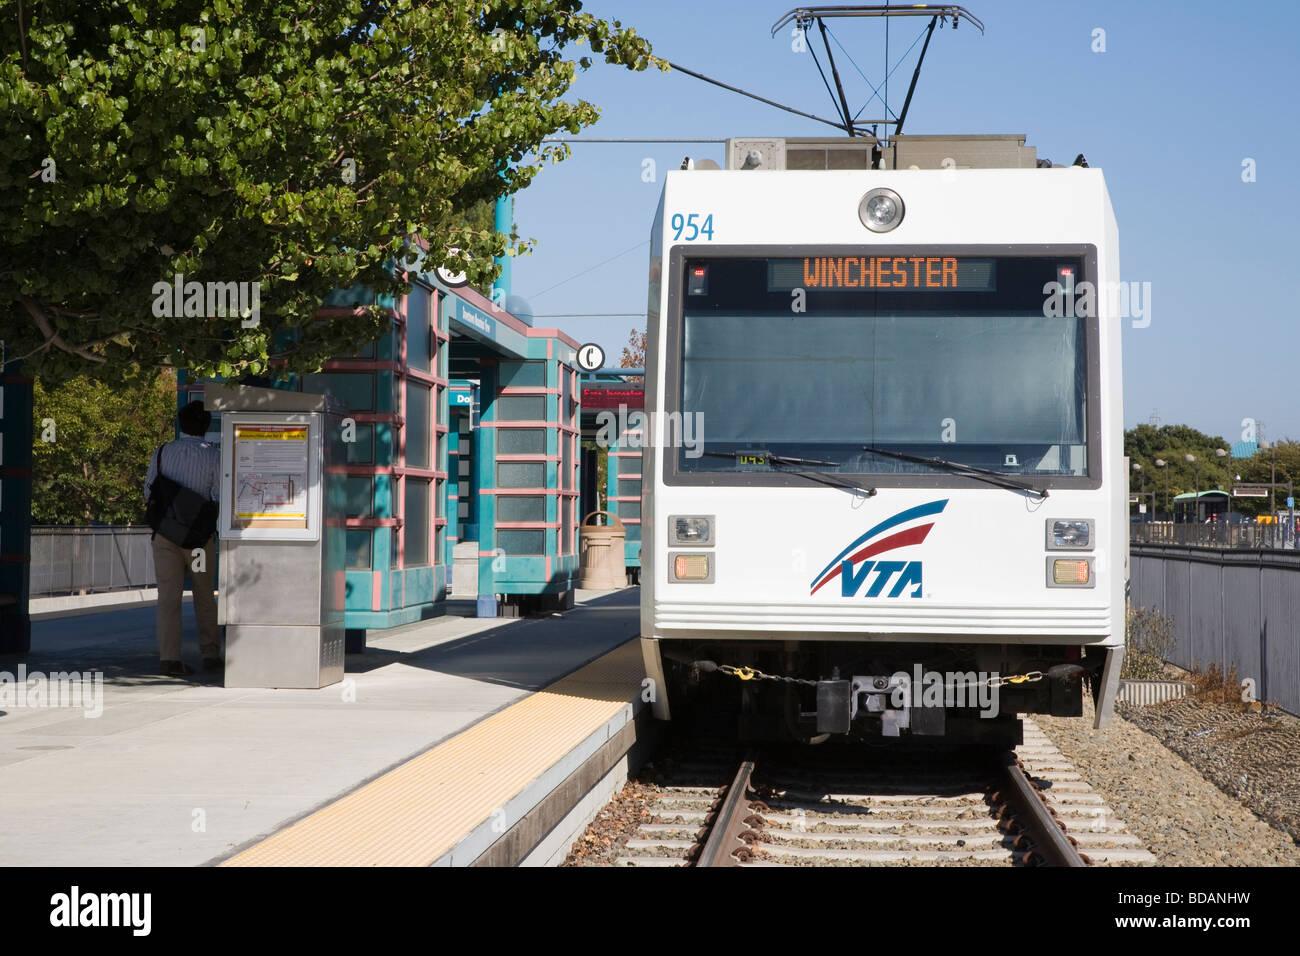 VTA (Valley Transportation Authority) Mass Transit Light Rail Train At  Station. Mountain View, California, USA